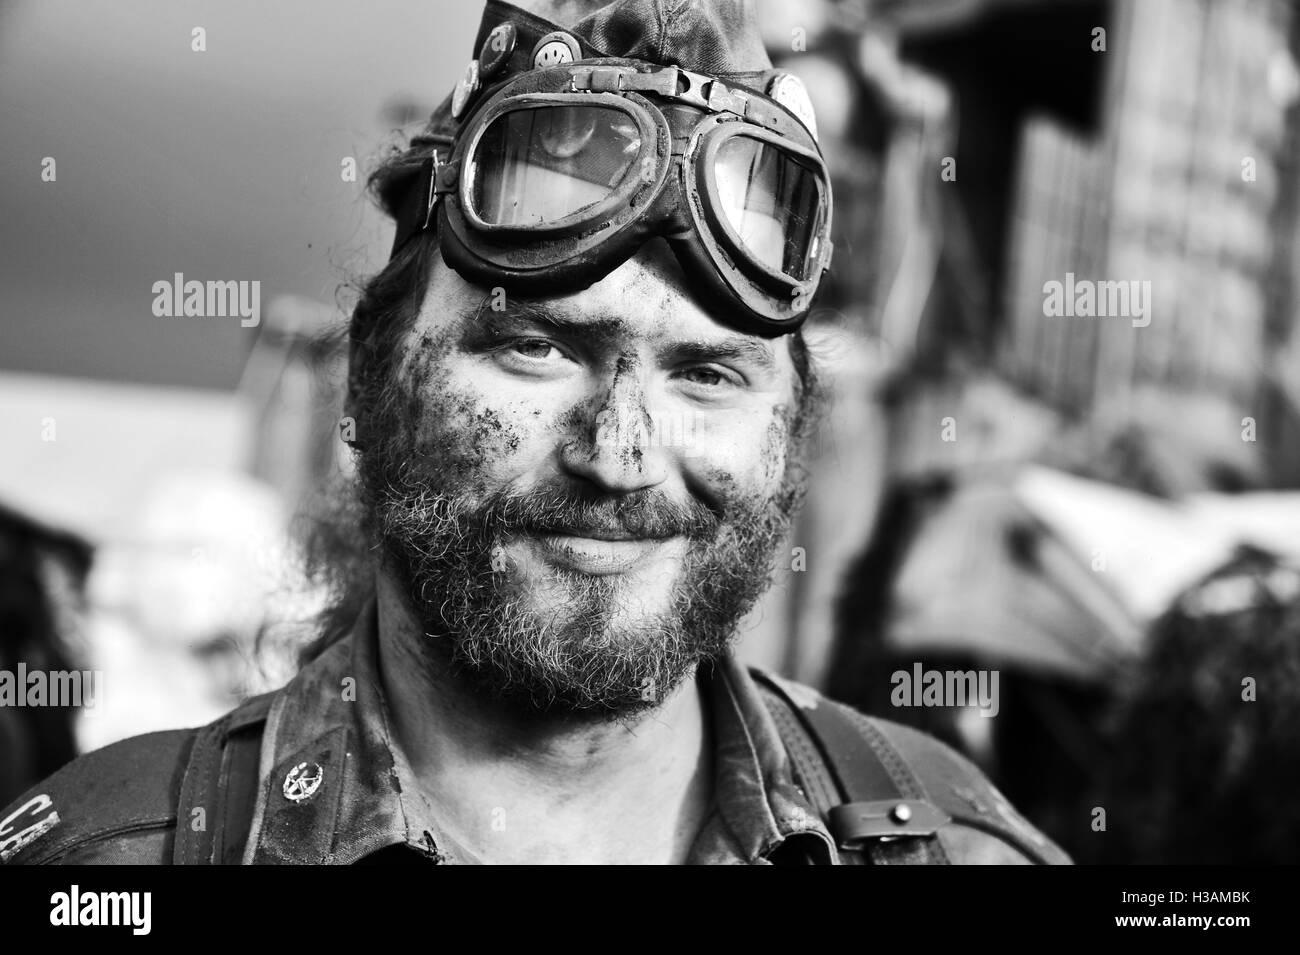 Wacken Open Air 2016: EUROPA, DEUTSCHLAND, WACKEN, 05.08.2016: Wasteland Warriors. Editorial use only. - Stock Image